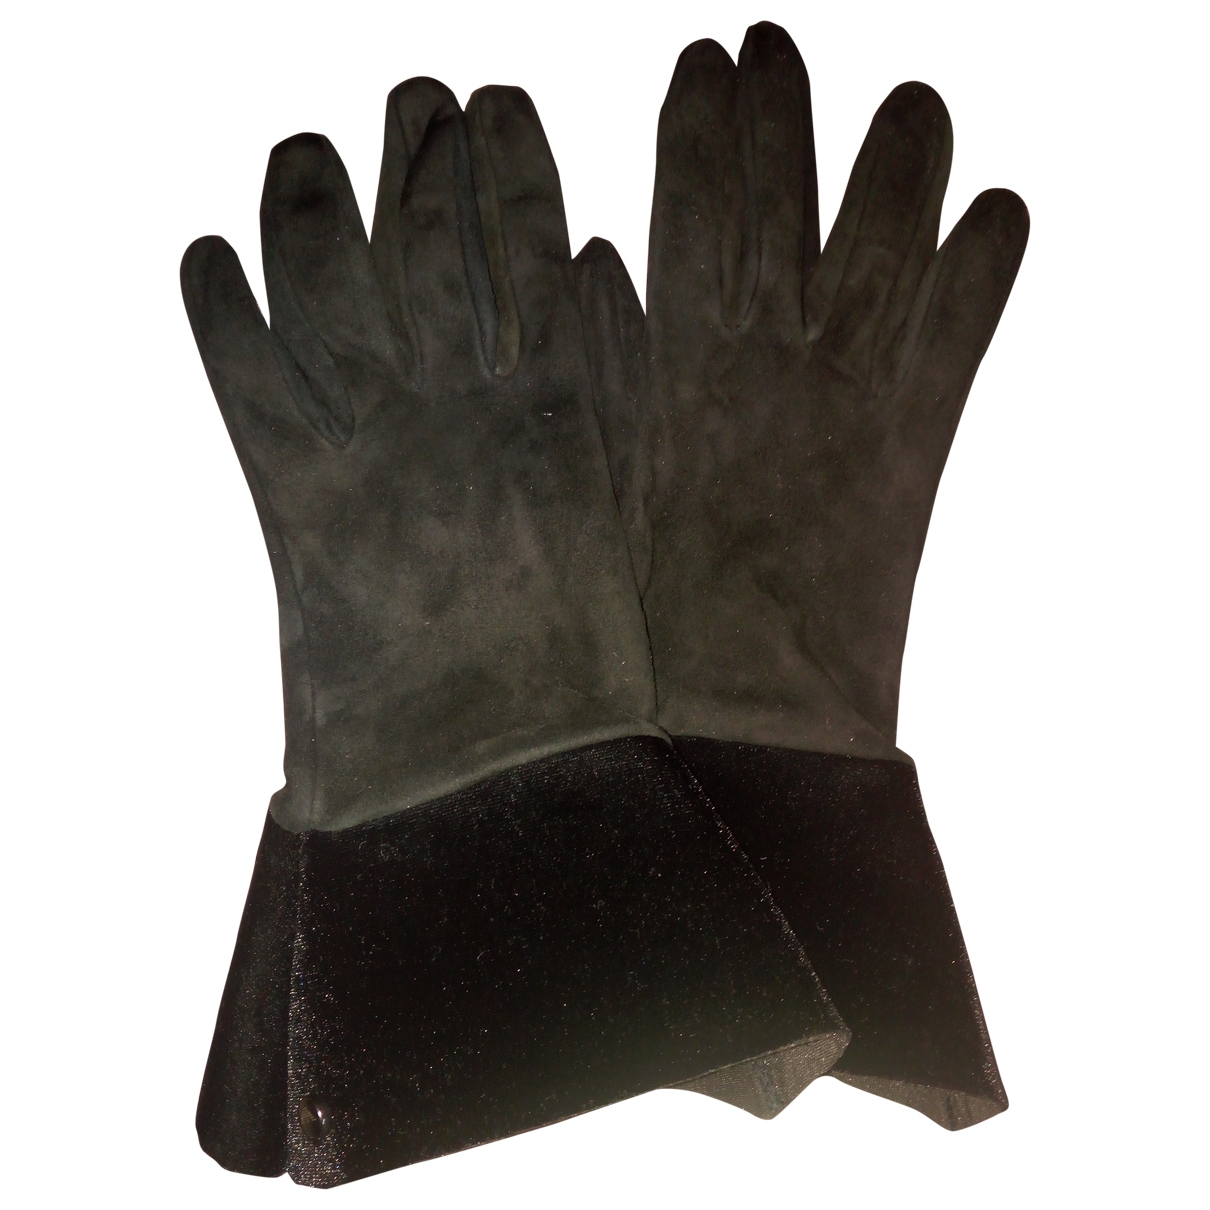 Emporio Armani \N Black Suede Gloves for Women M International